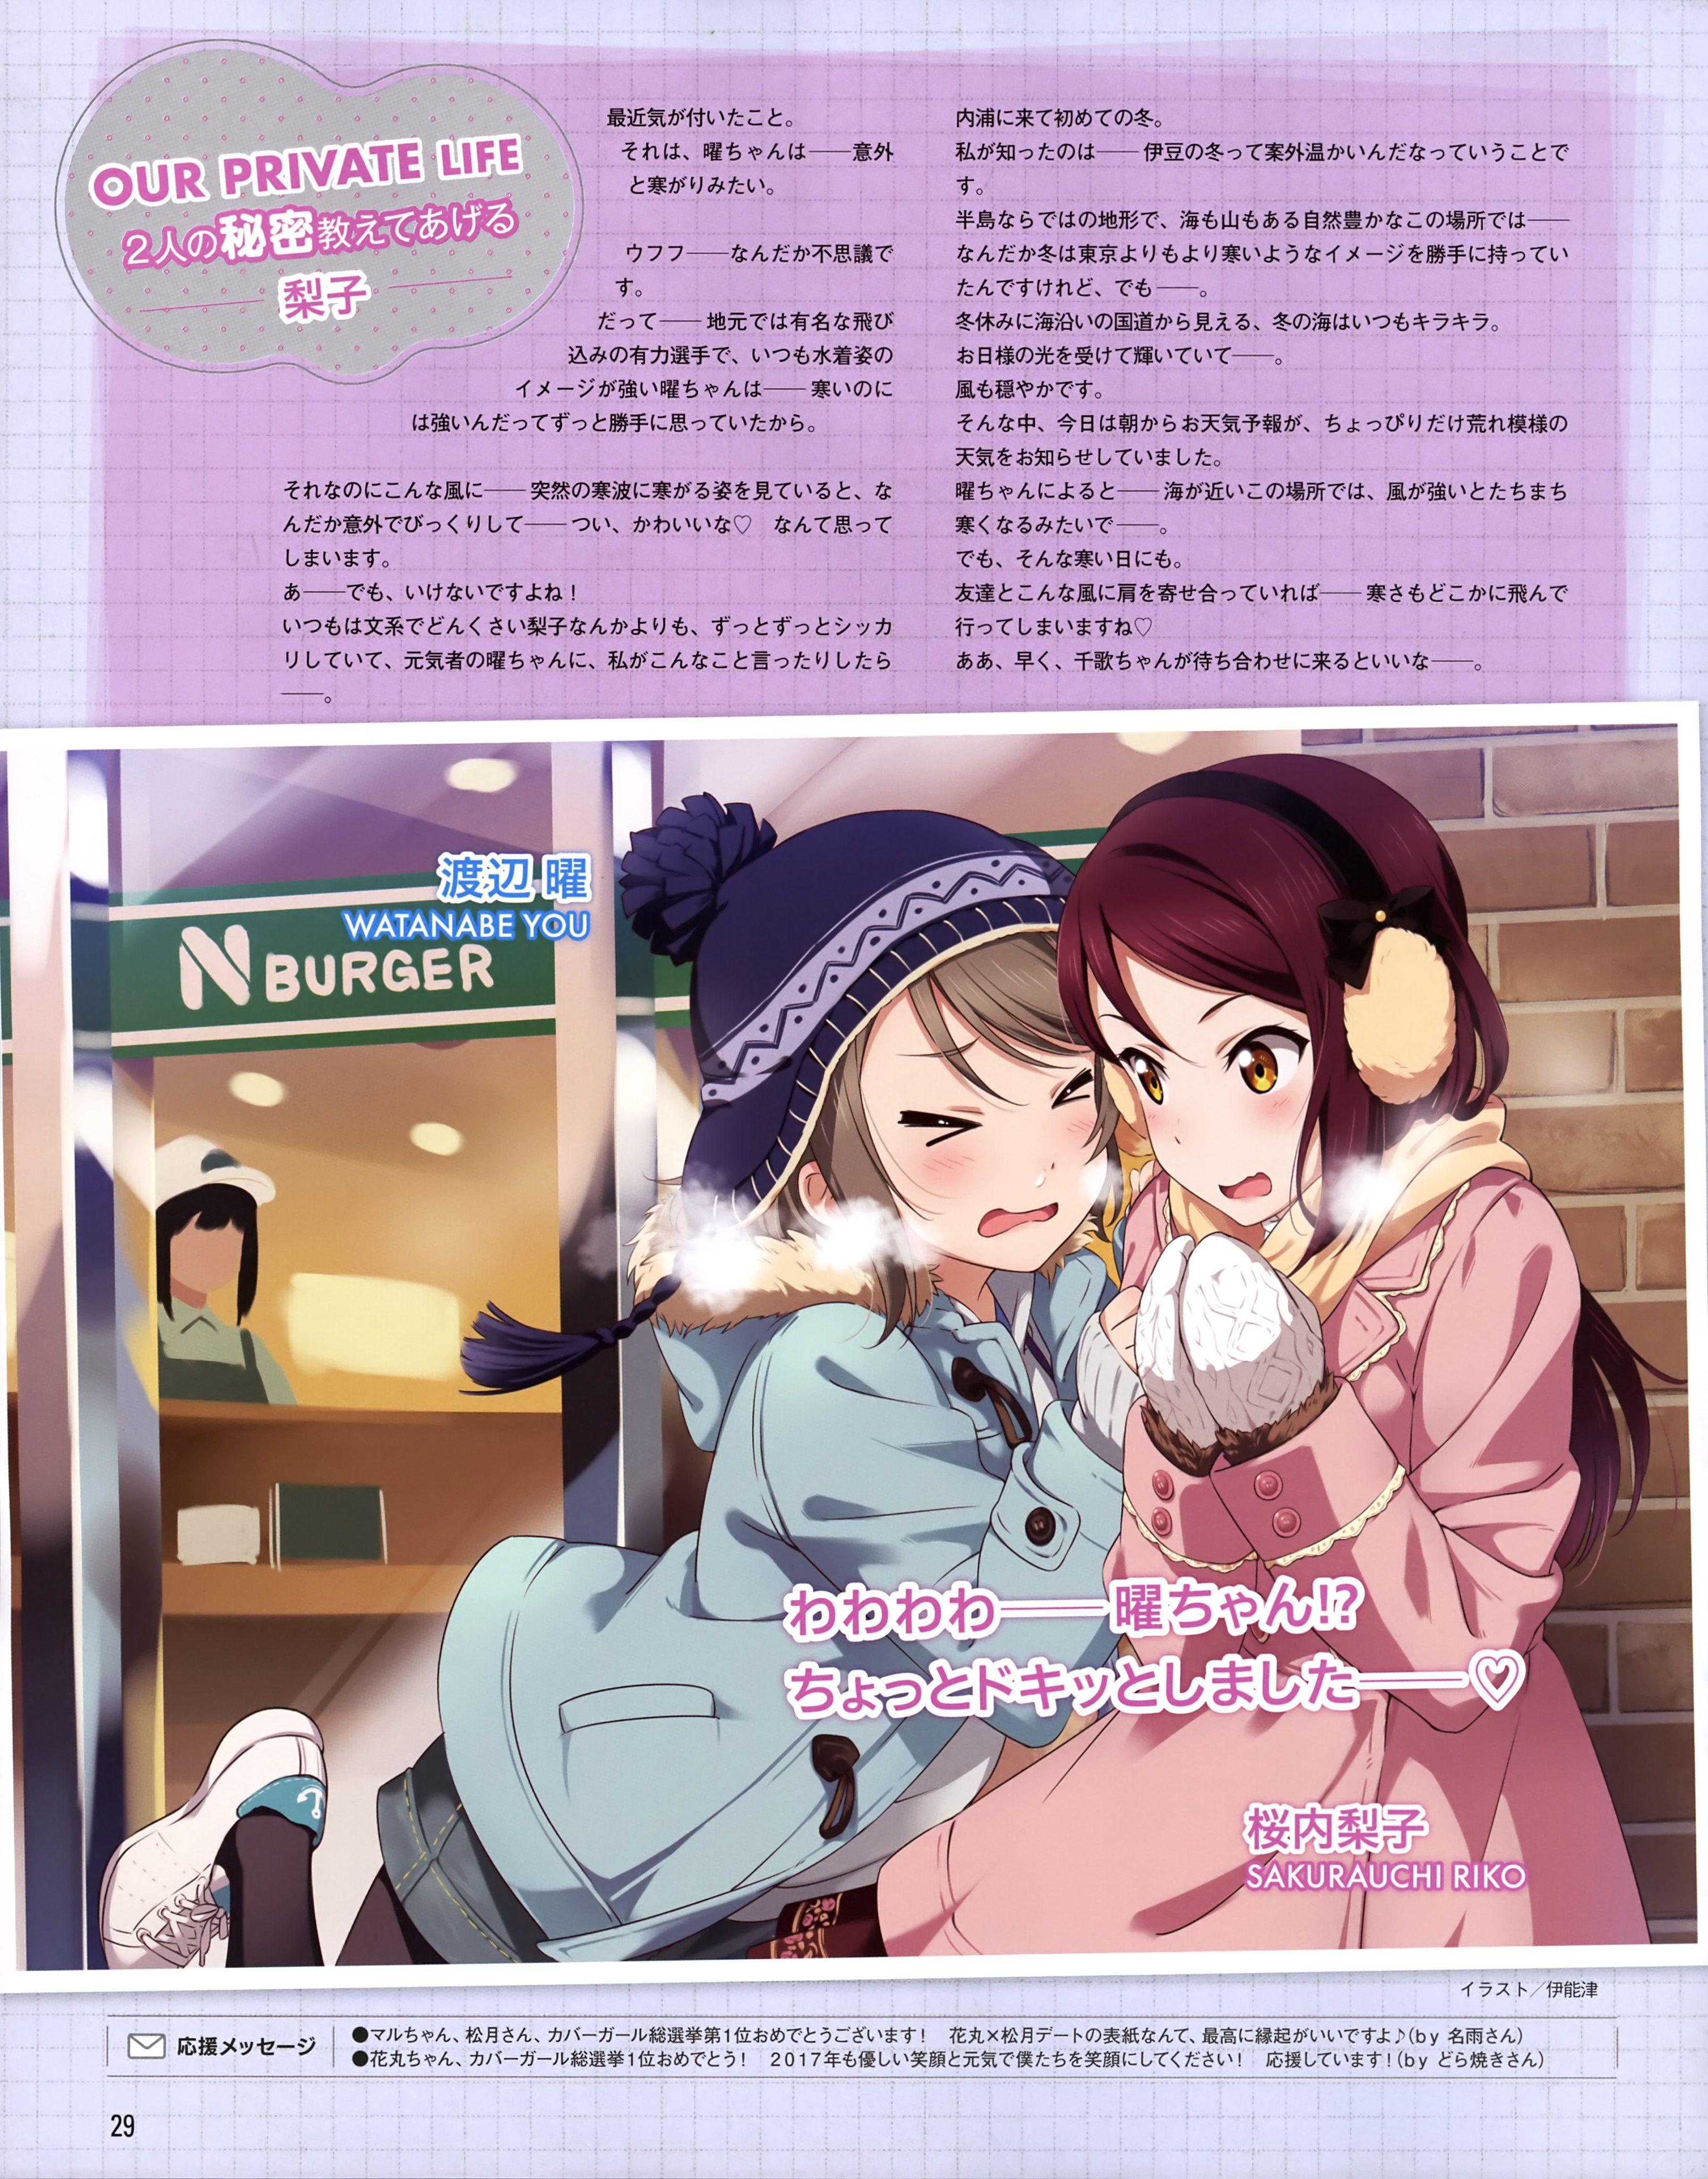 Sunrise (Studio), Love Live! Sunshine!!, Watanabe You, Sakurauchi Riko